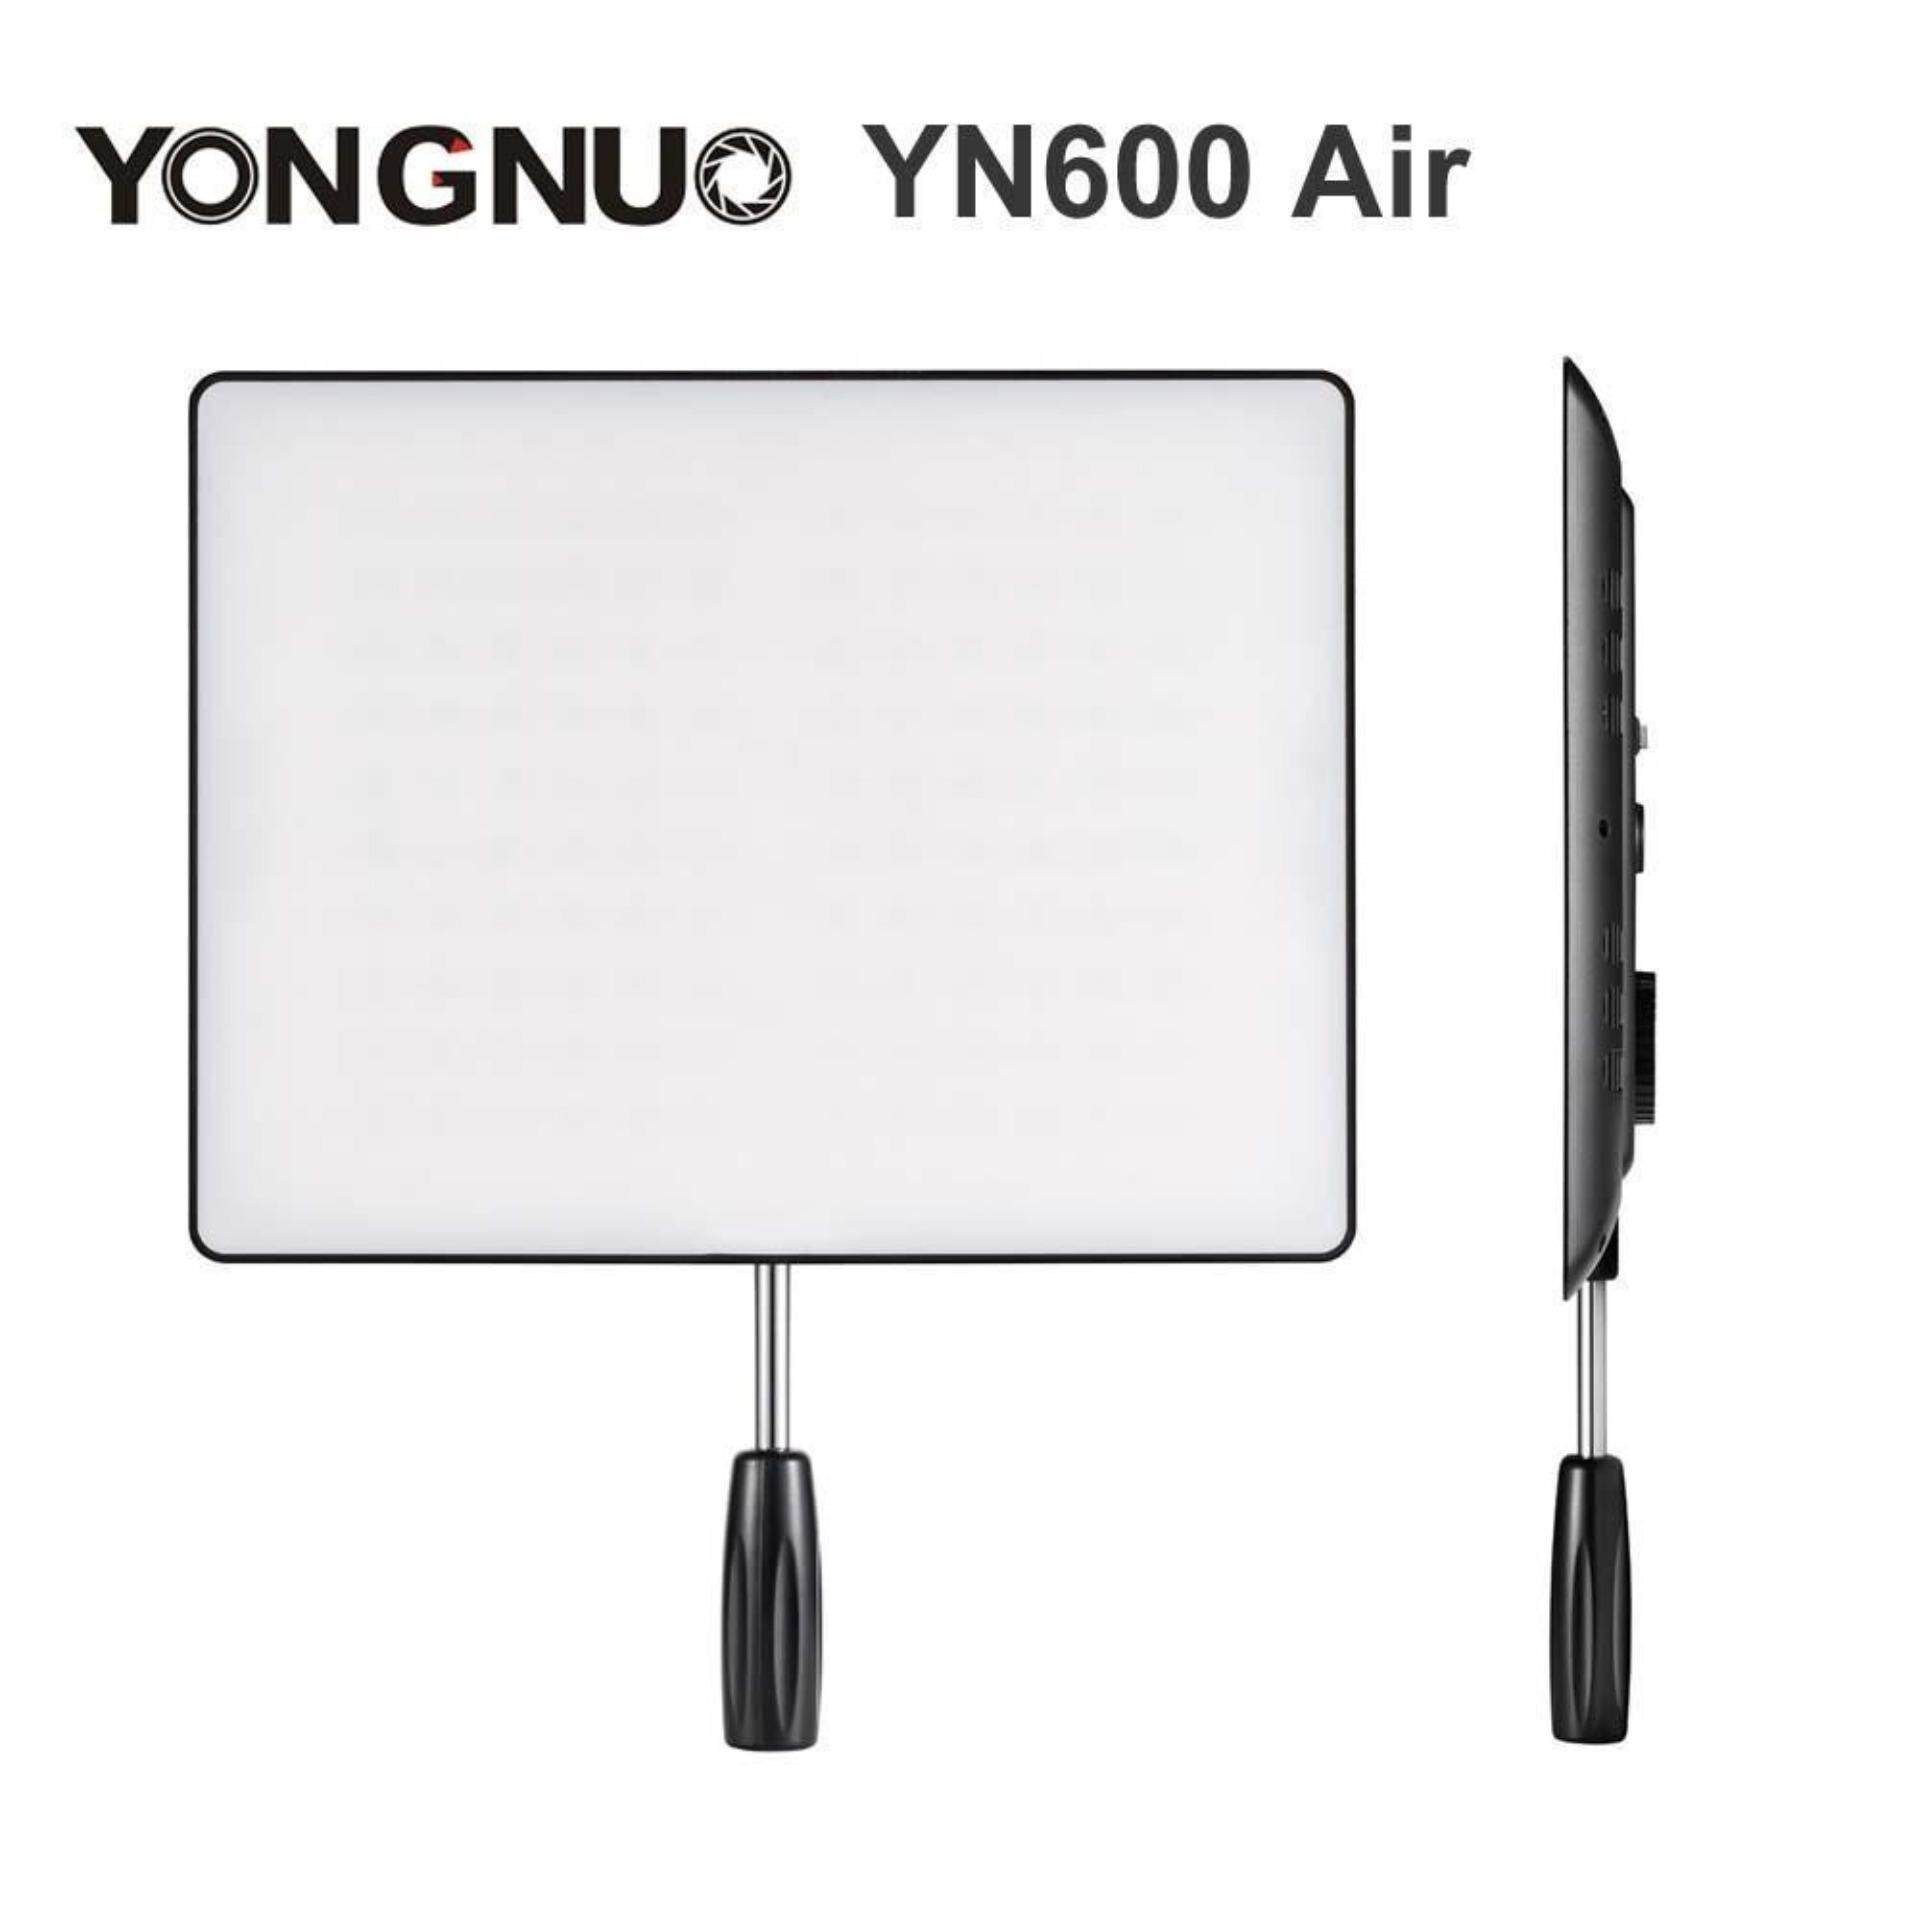 Cheaper Yongnuo Yn600 Air Ultra Thin Led Camera Video Light Panel 3200K 5500K Bi Color P Intl